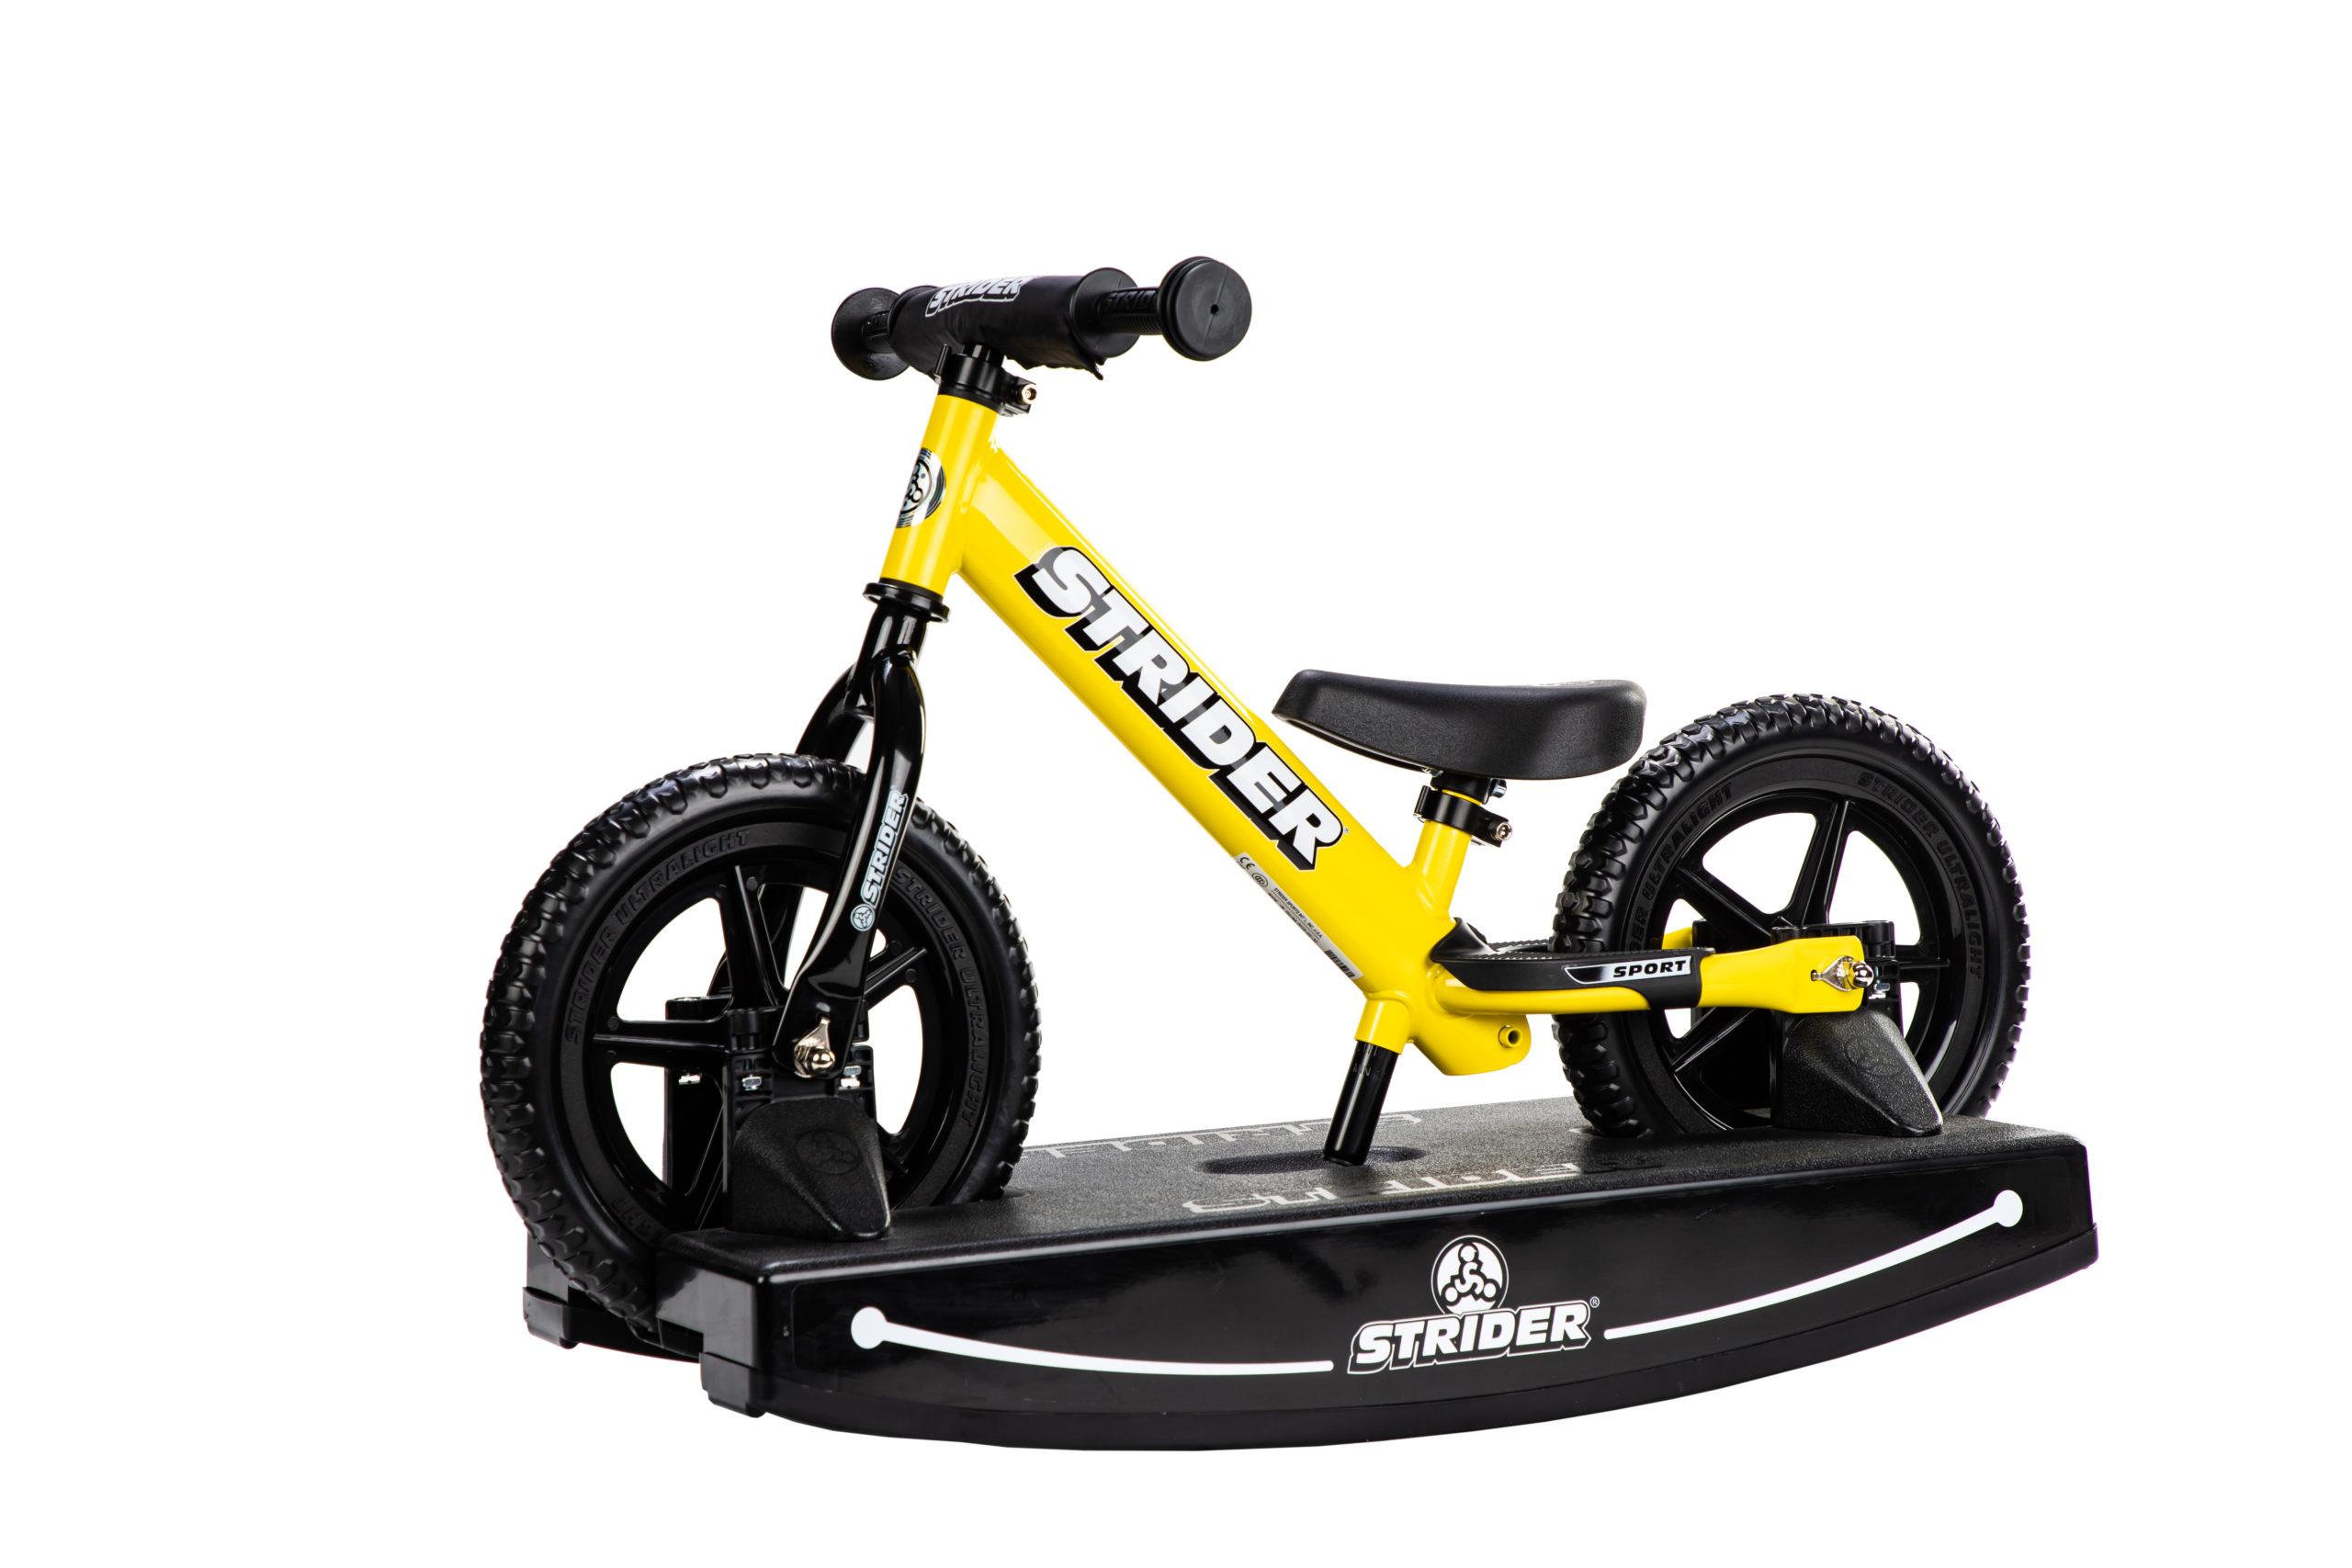 Studio Image of yellow 12 Sport 2-in-1 Rocking Bike